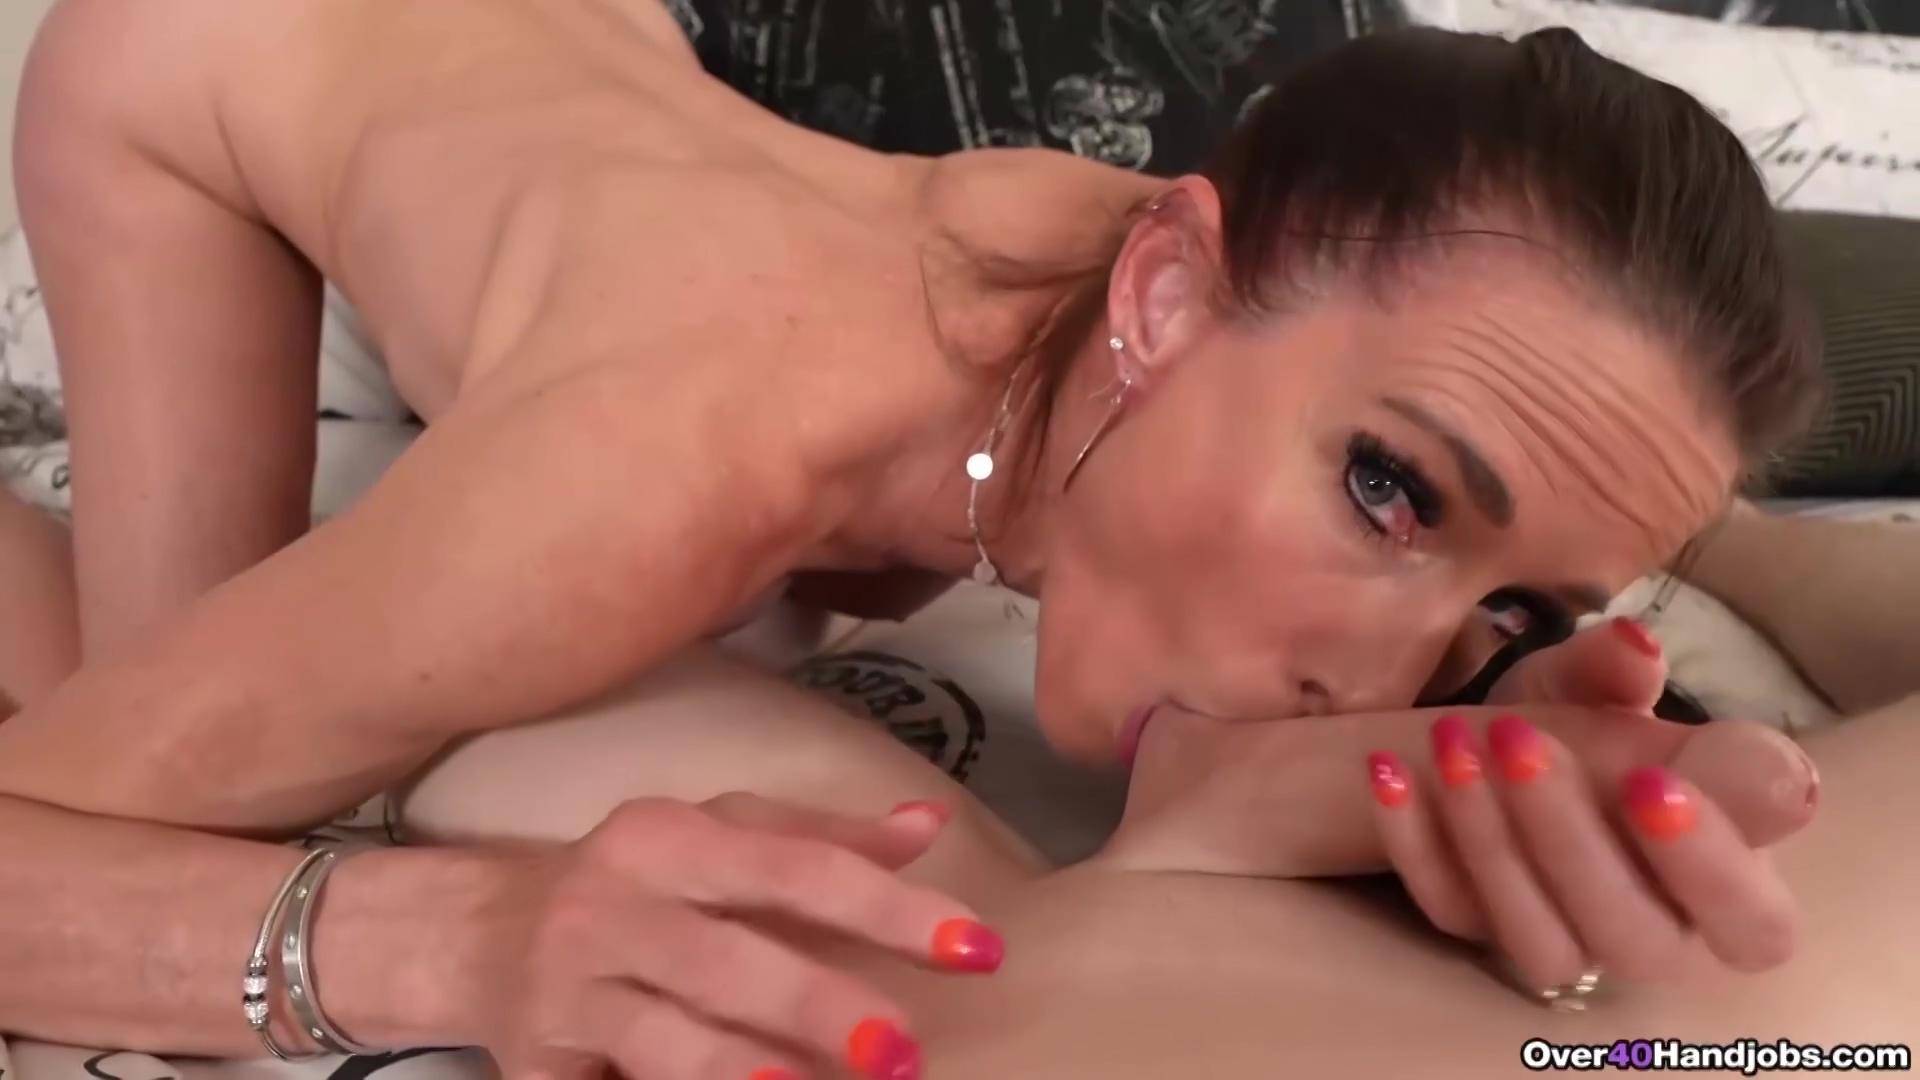 Sofie Marie - String Bikini Milf Pov Handjob